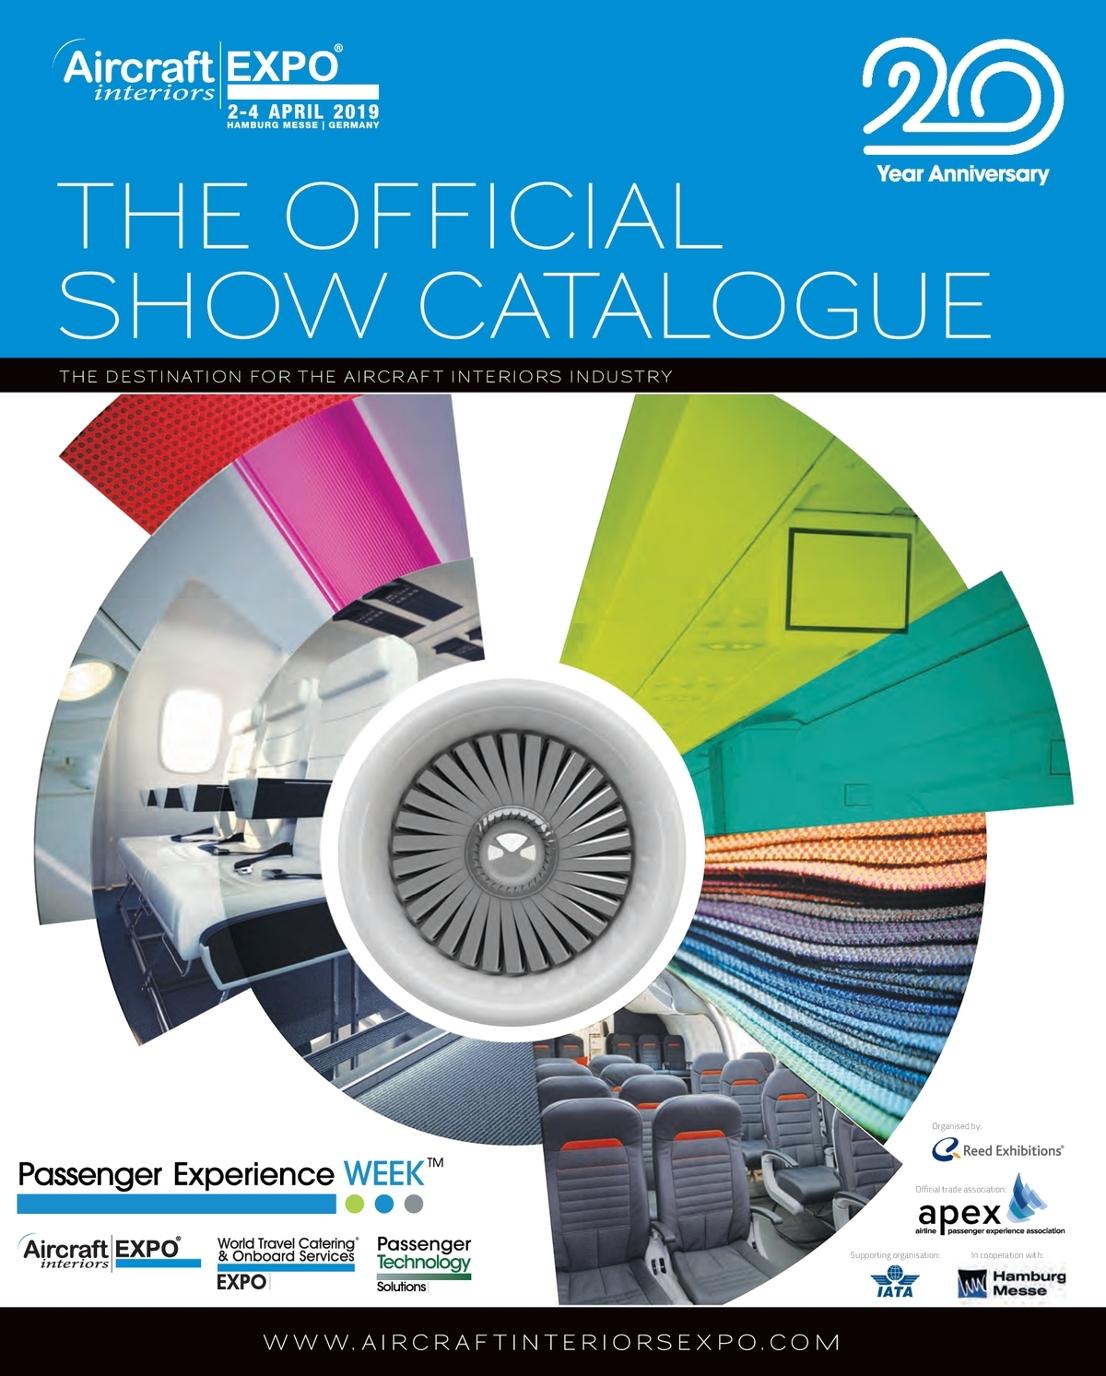 Aircraft Interiors Expo Official Show Catalogue 2019